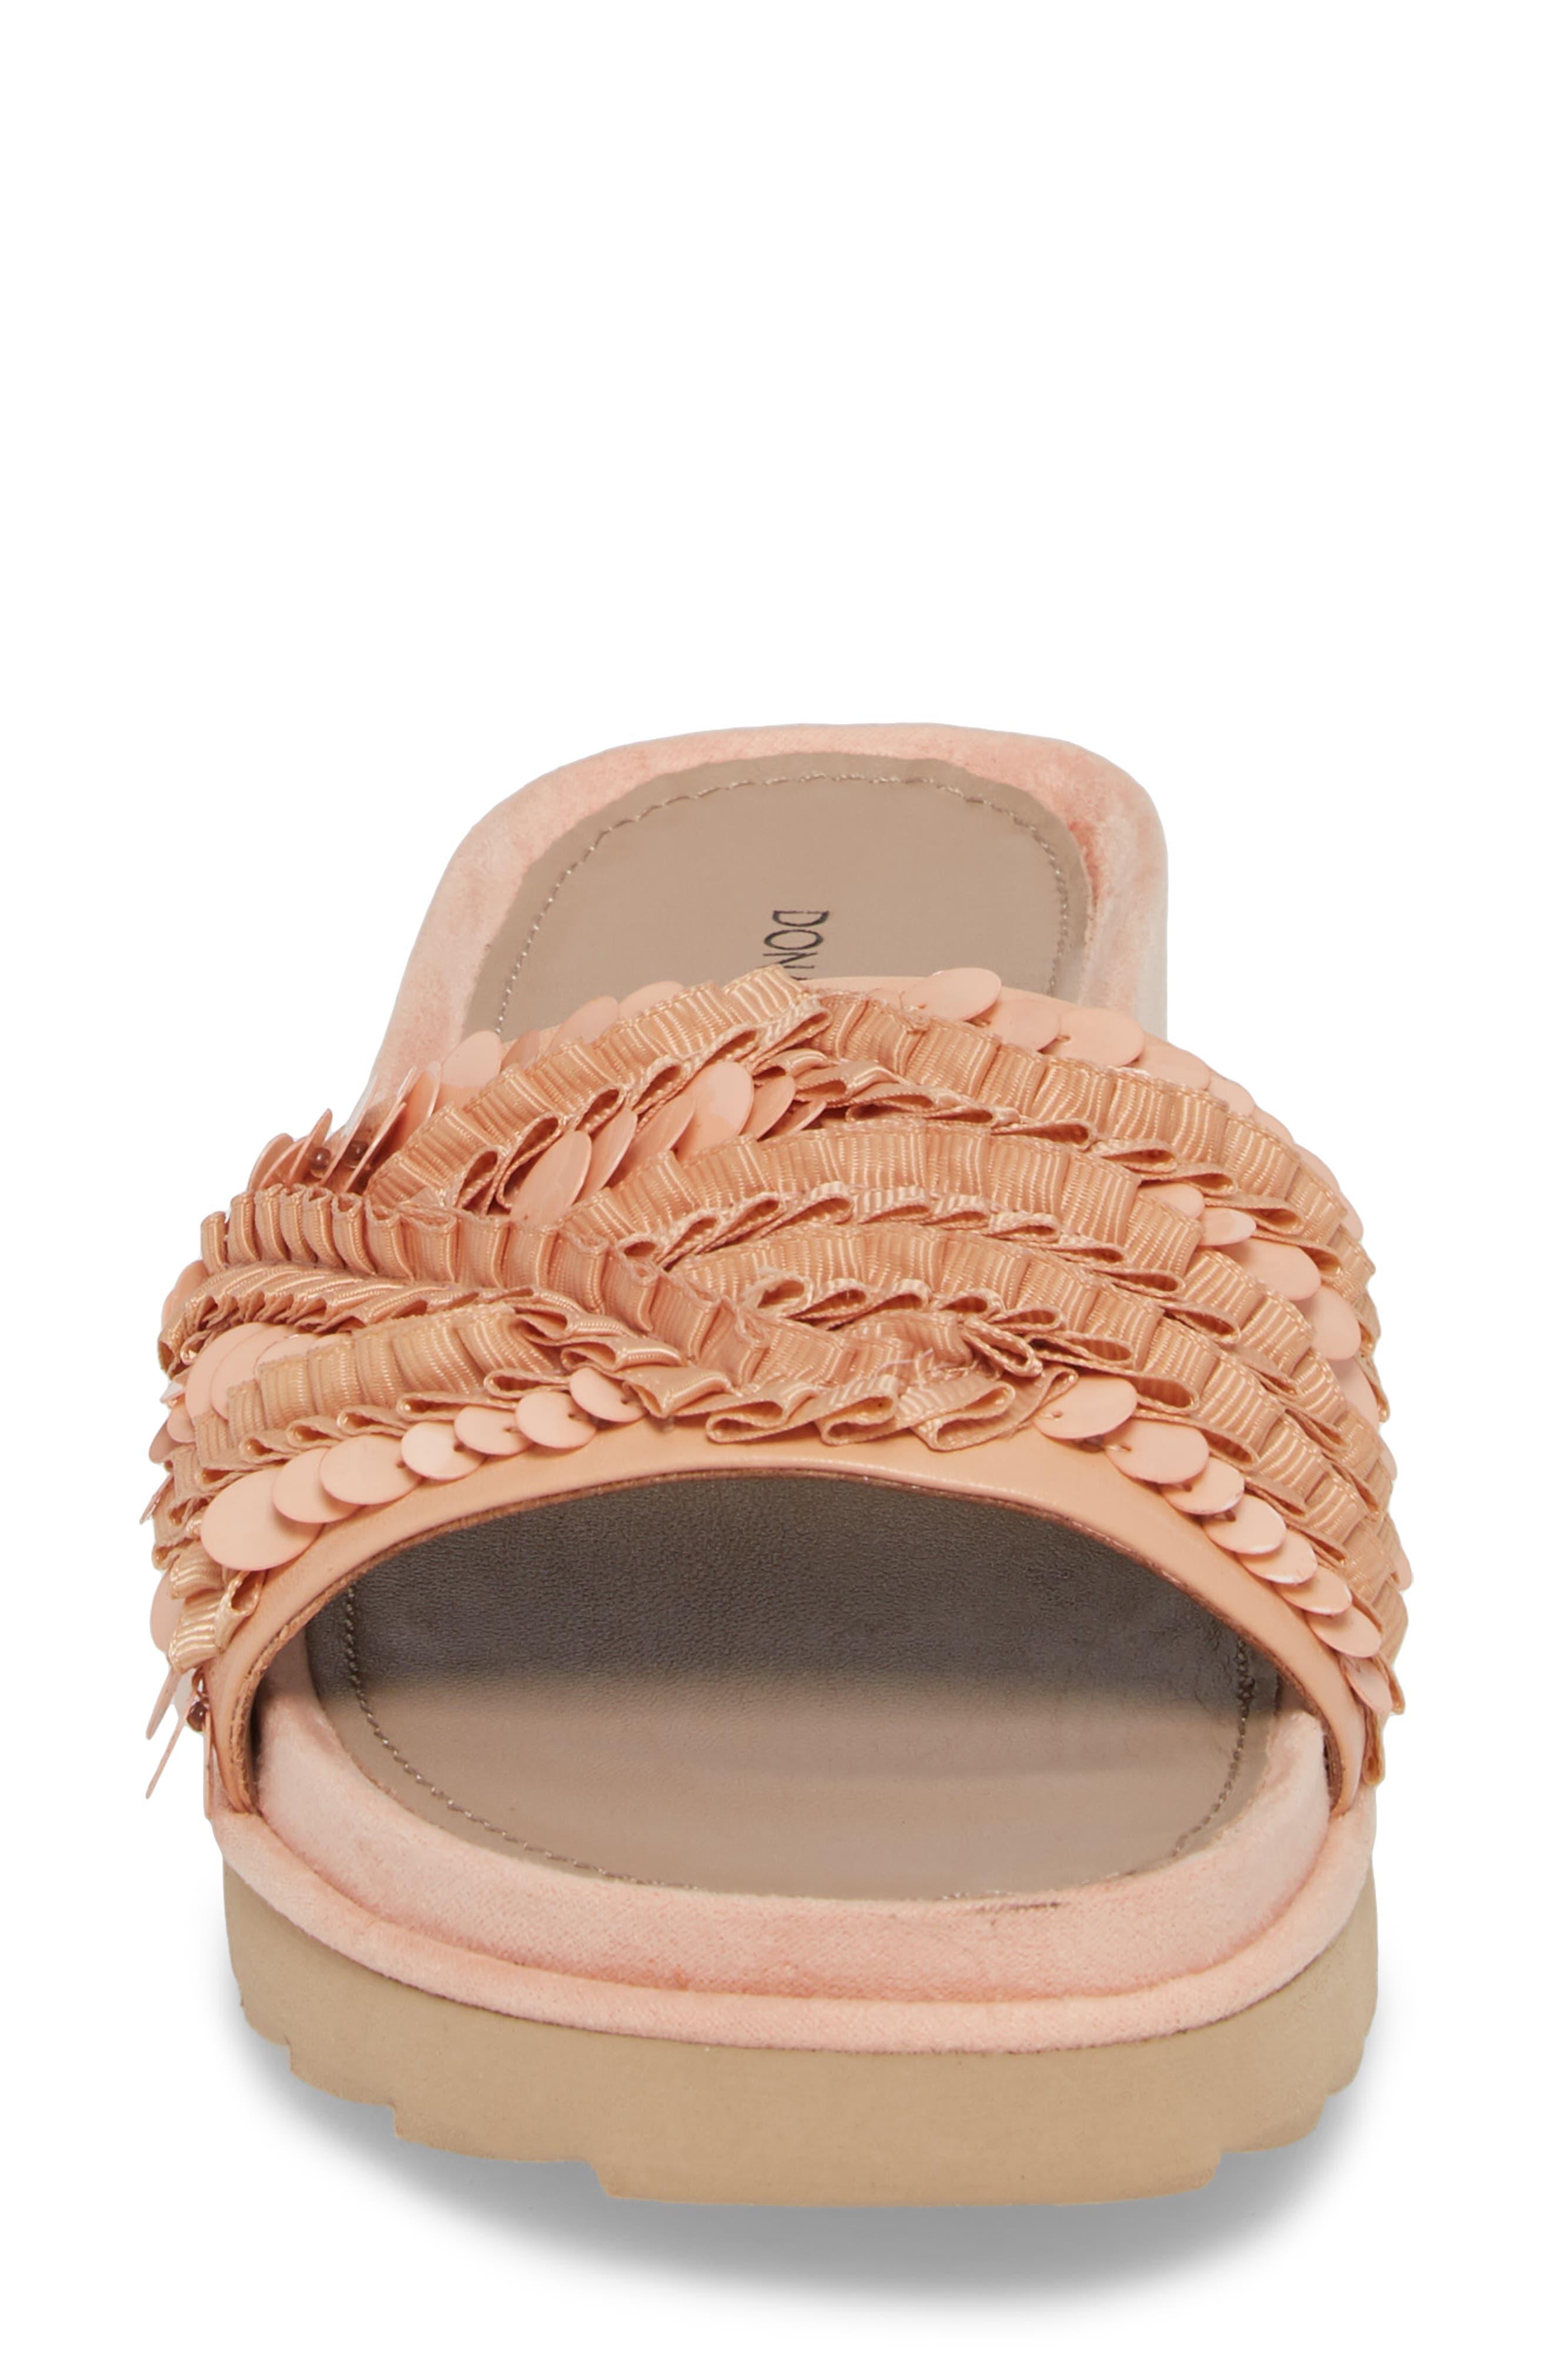 Cava Slide Sandal,                             Alternate thumbnail 6, color,                             Peony Leather